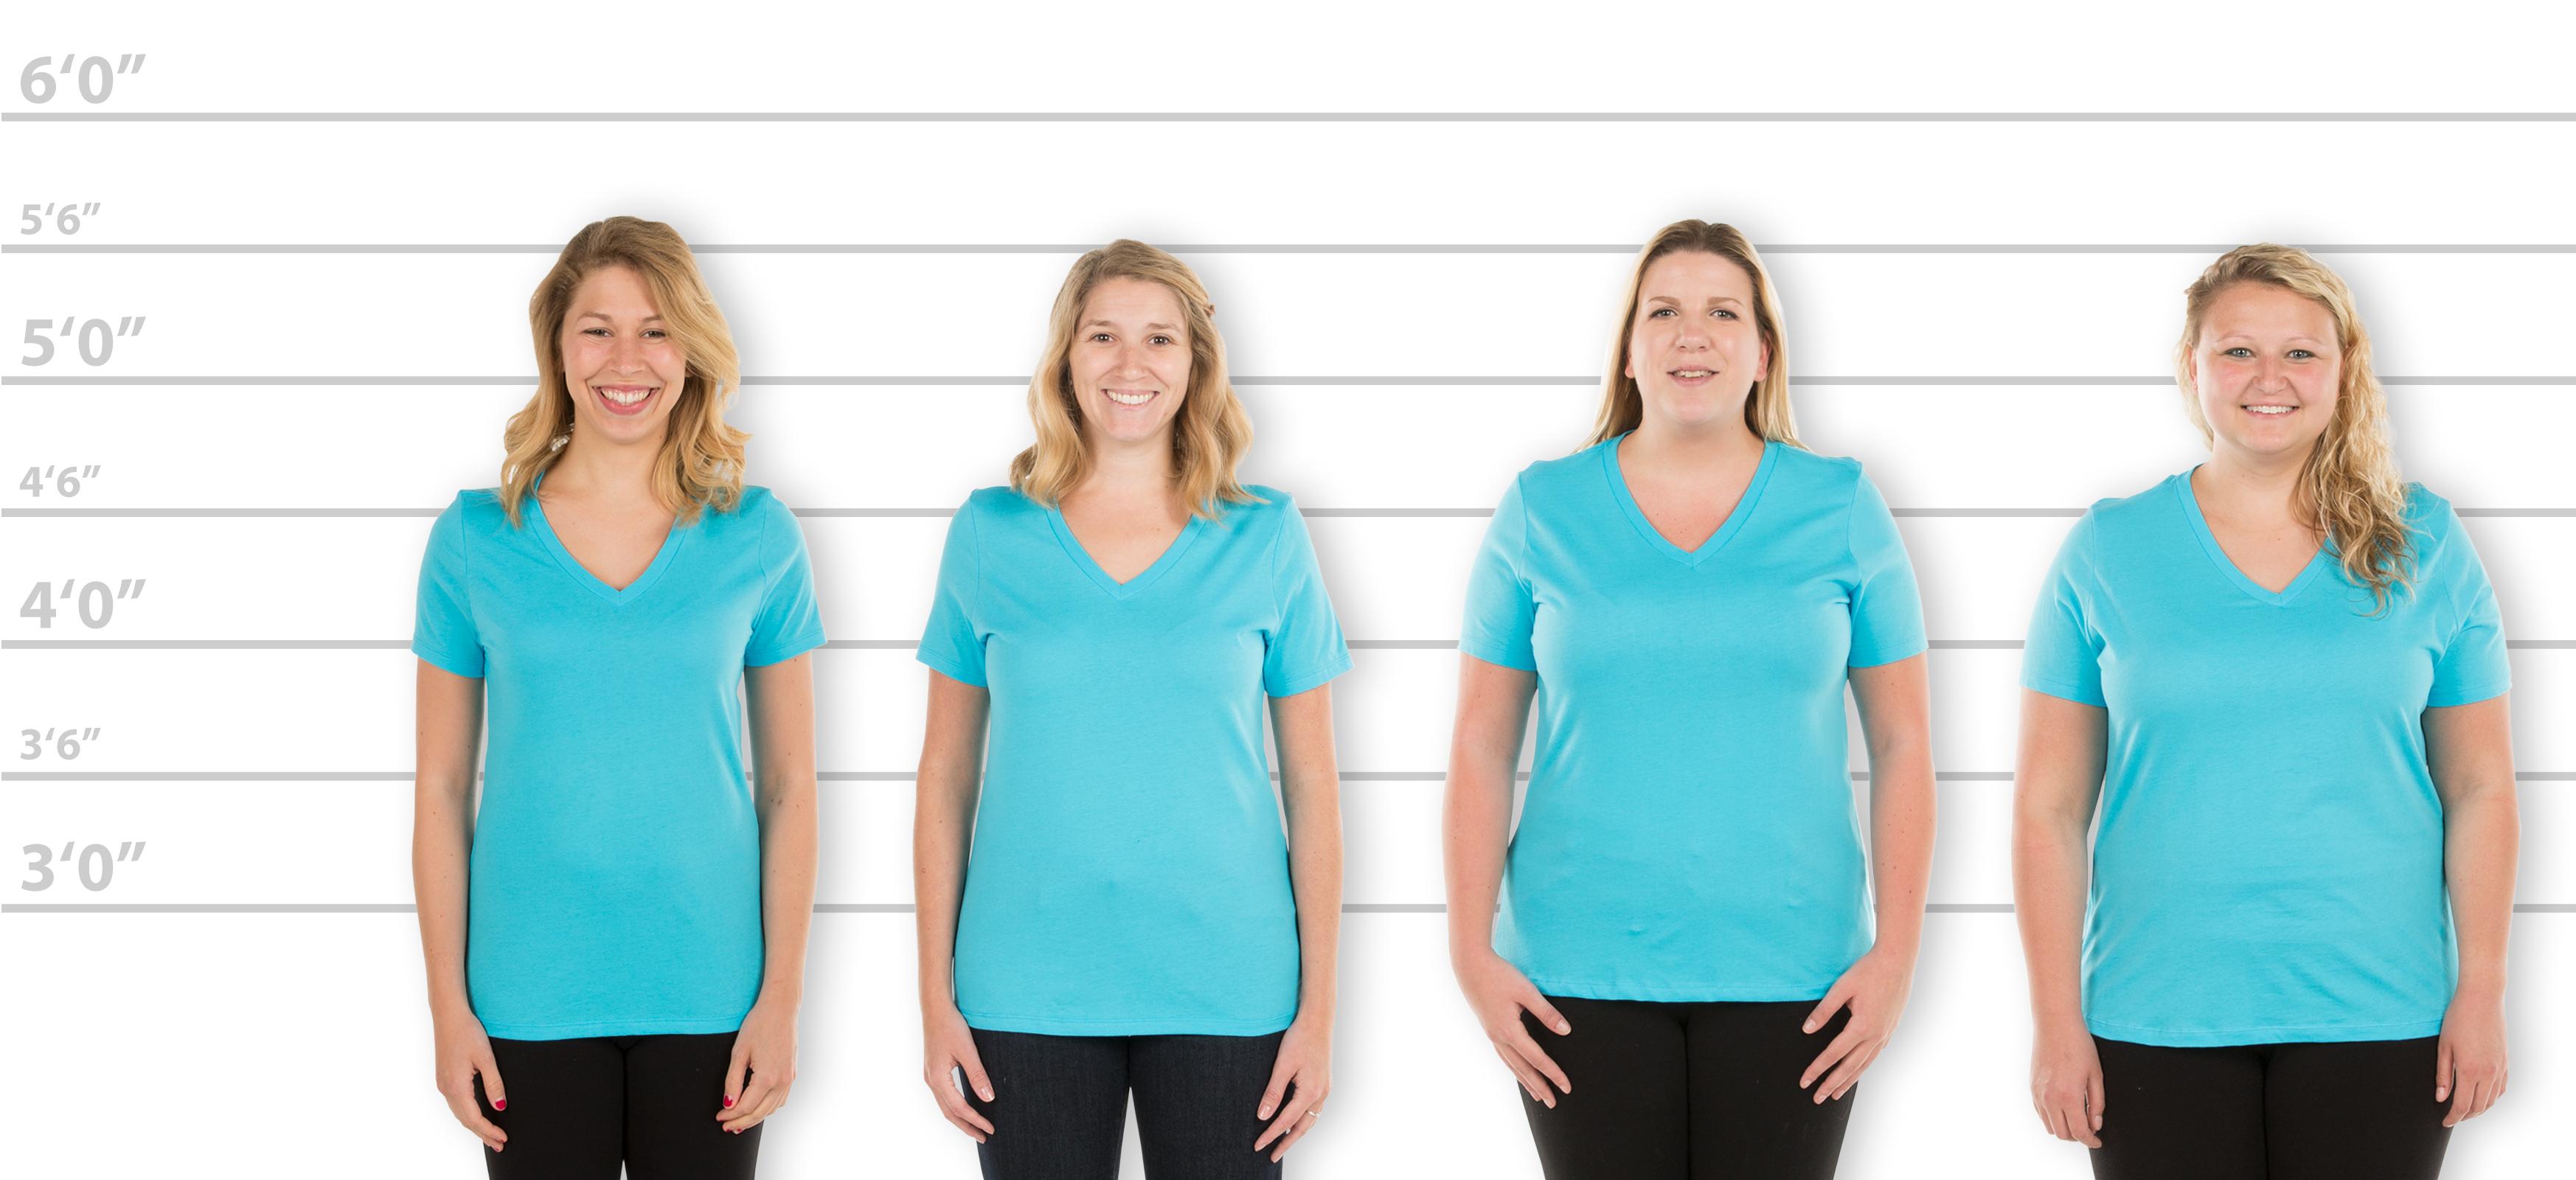 Customink Sizing Line Up For Bella Womens V Neck T Shirt